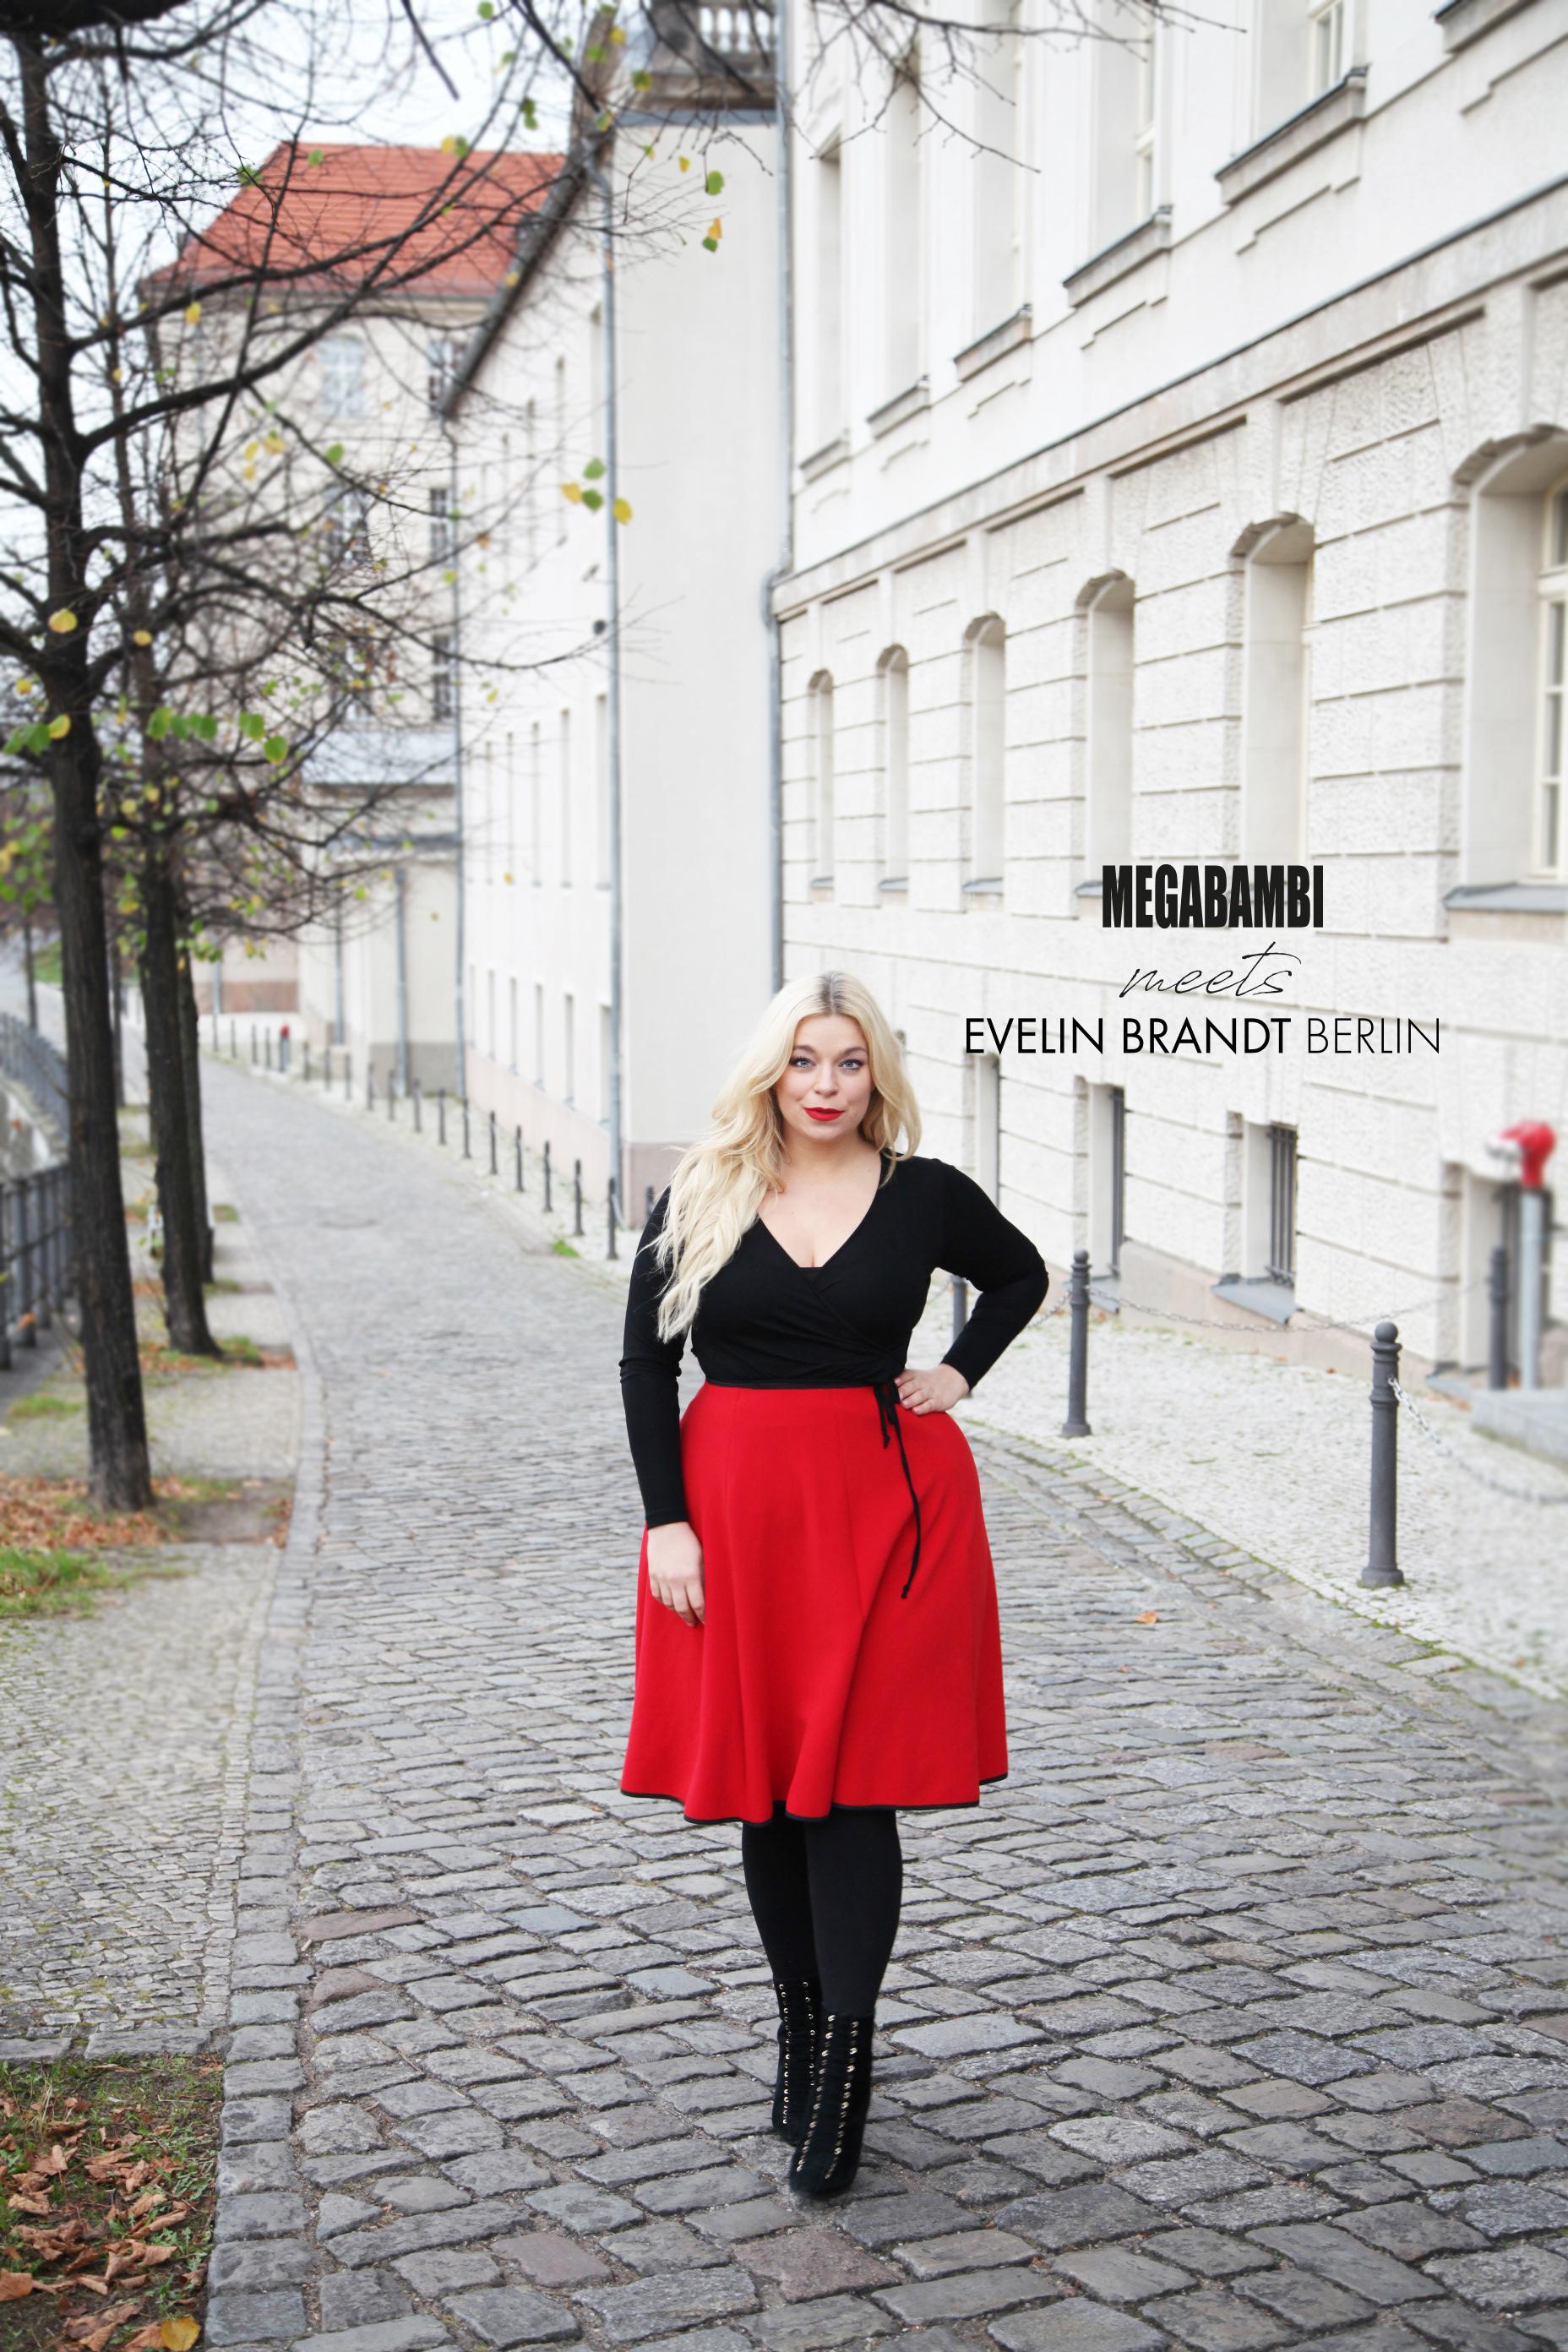 Megabambi-Plussize-Designerin-curvy-caterina-pogorzelski-Moderatorin